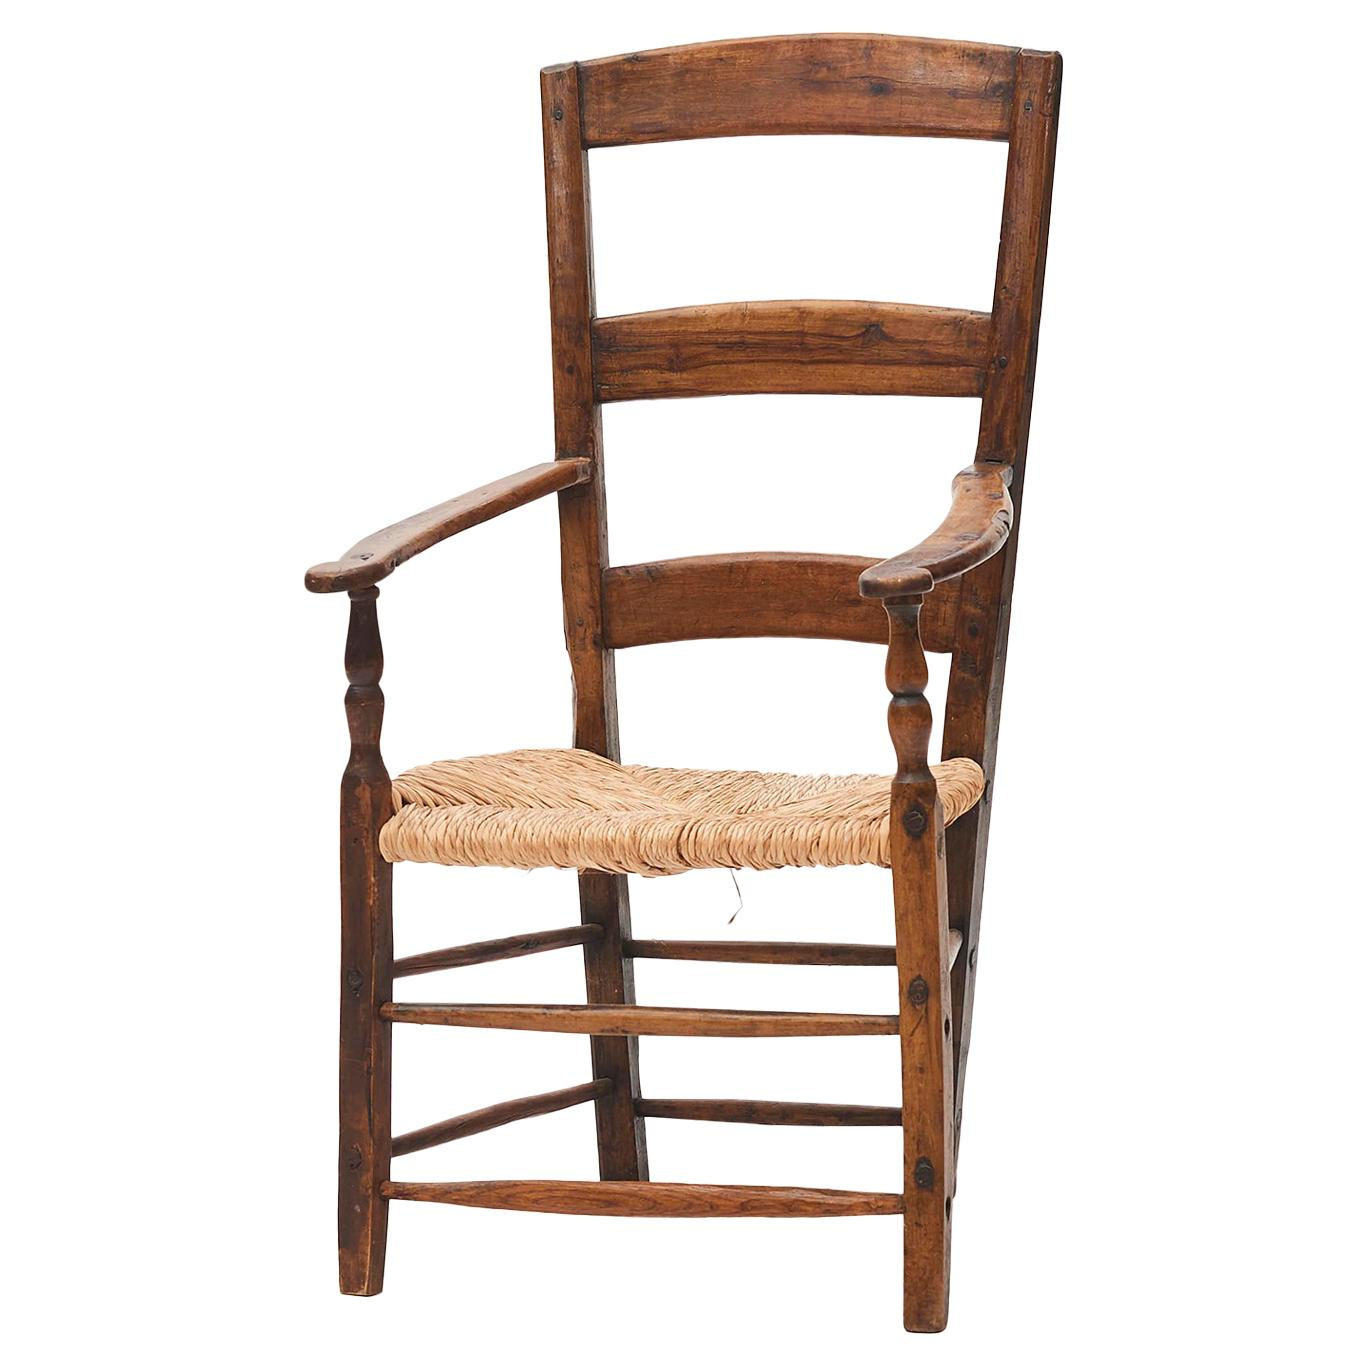 Mid-18th Century English Teak Ladder Back Armchair with Rush Seat